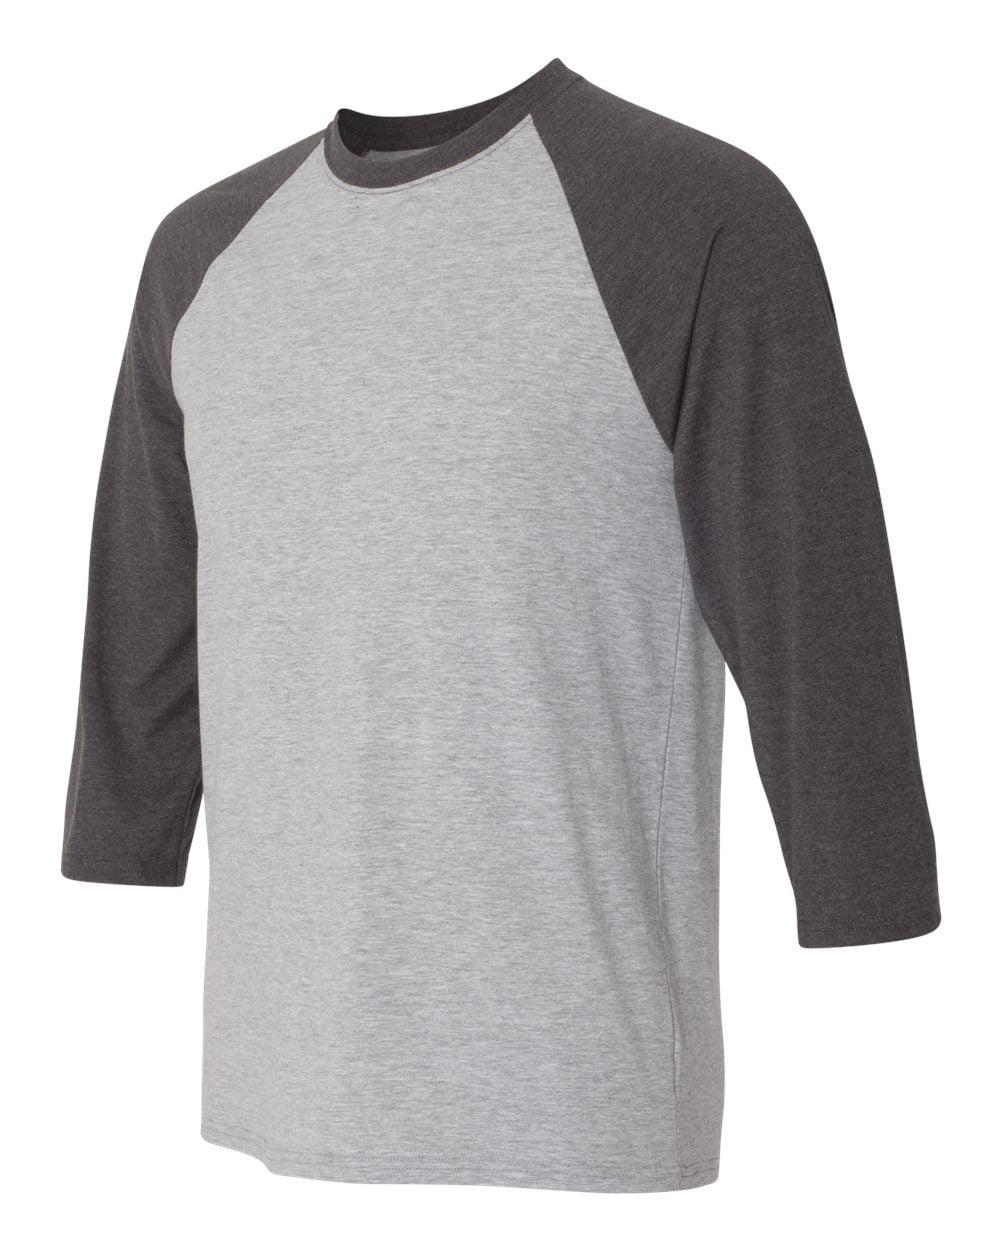 Hanes - X-Temp 3/4 Sleeve Baseball T Shirt